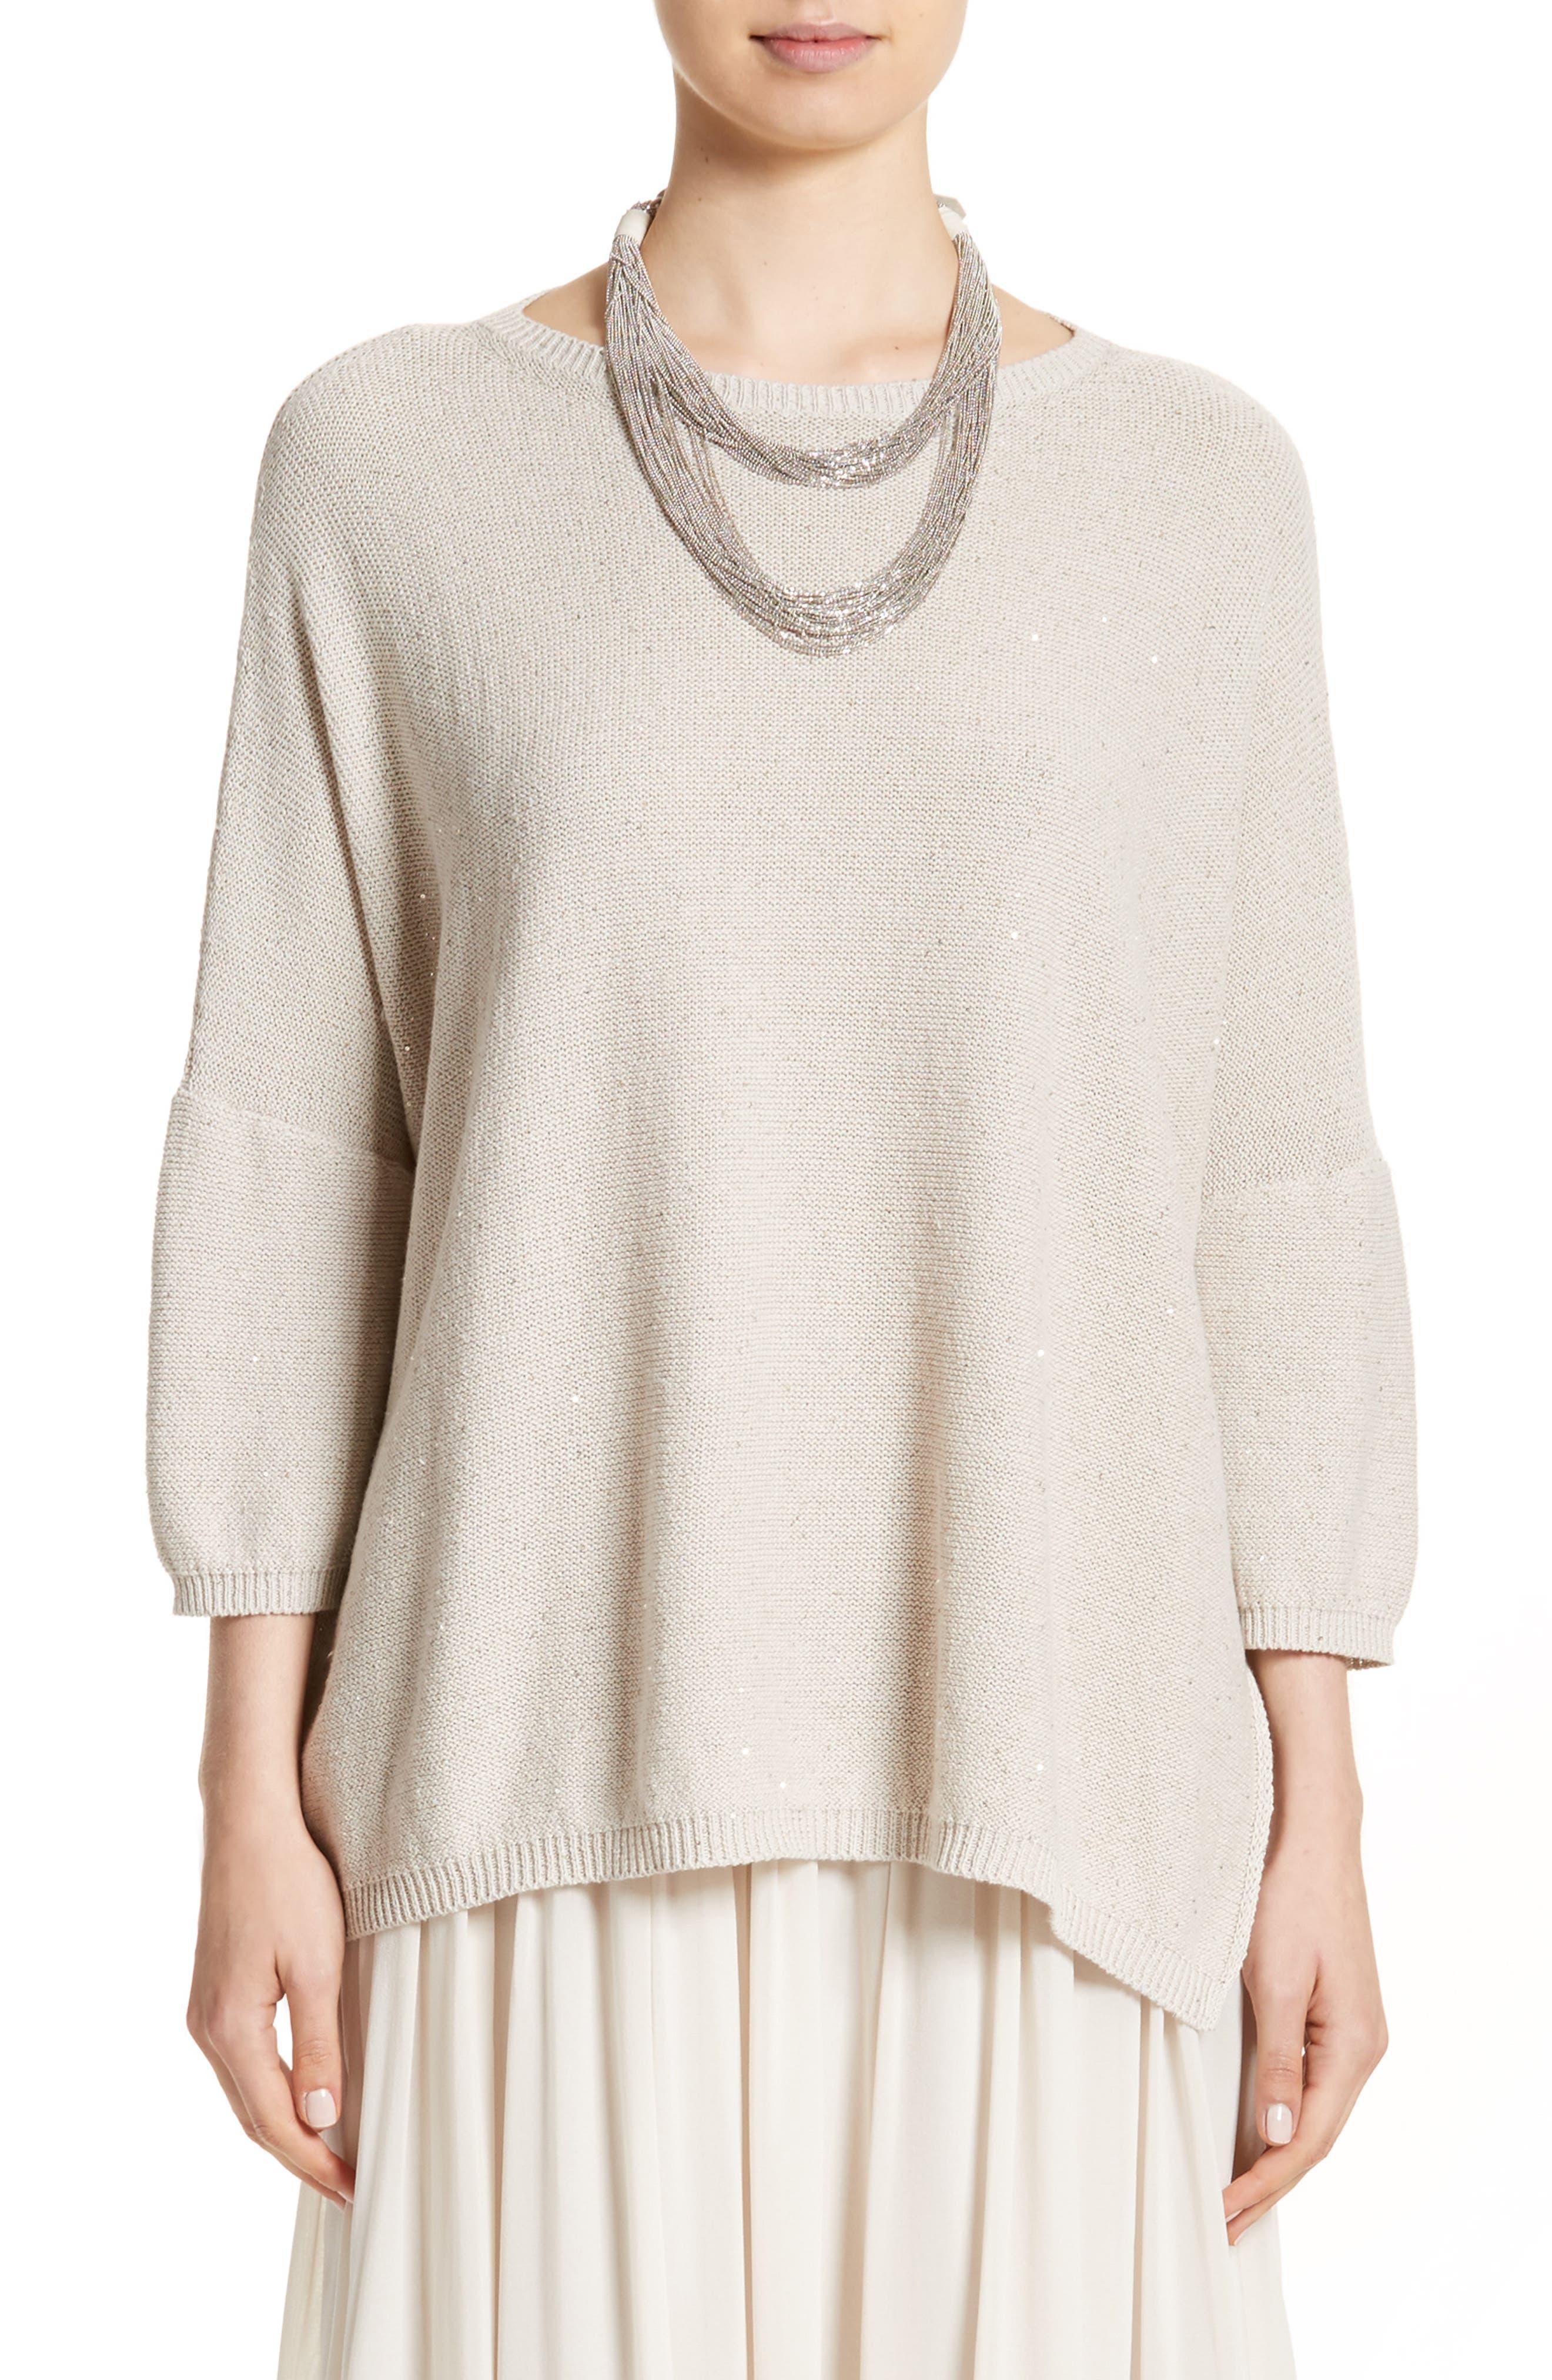 Alternate Image 1 Selected - Fabiana Filippi Sequin Knit Dolman Sweater